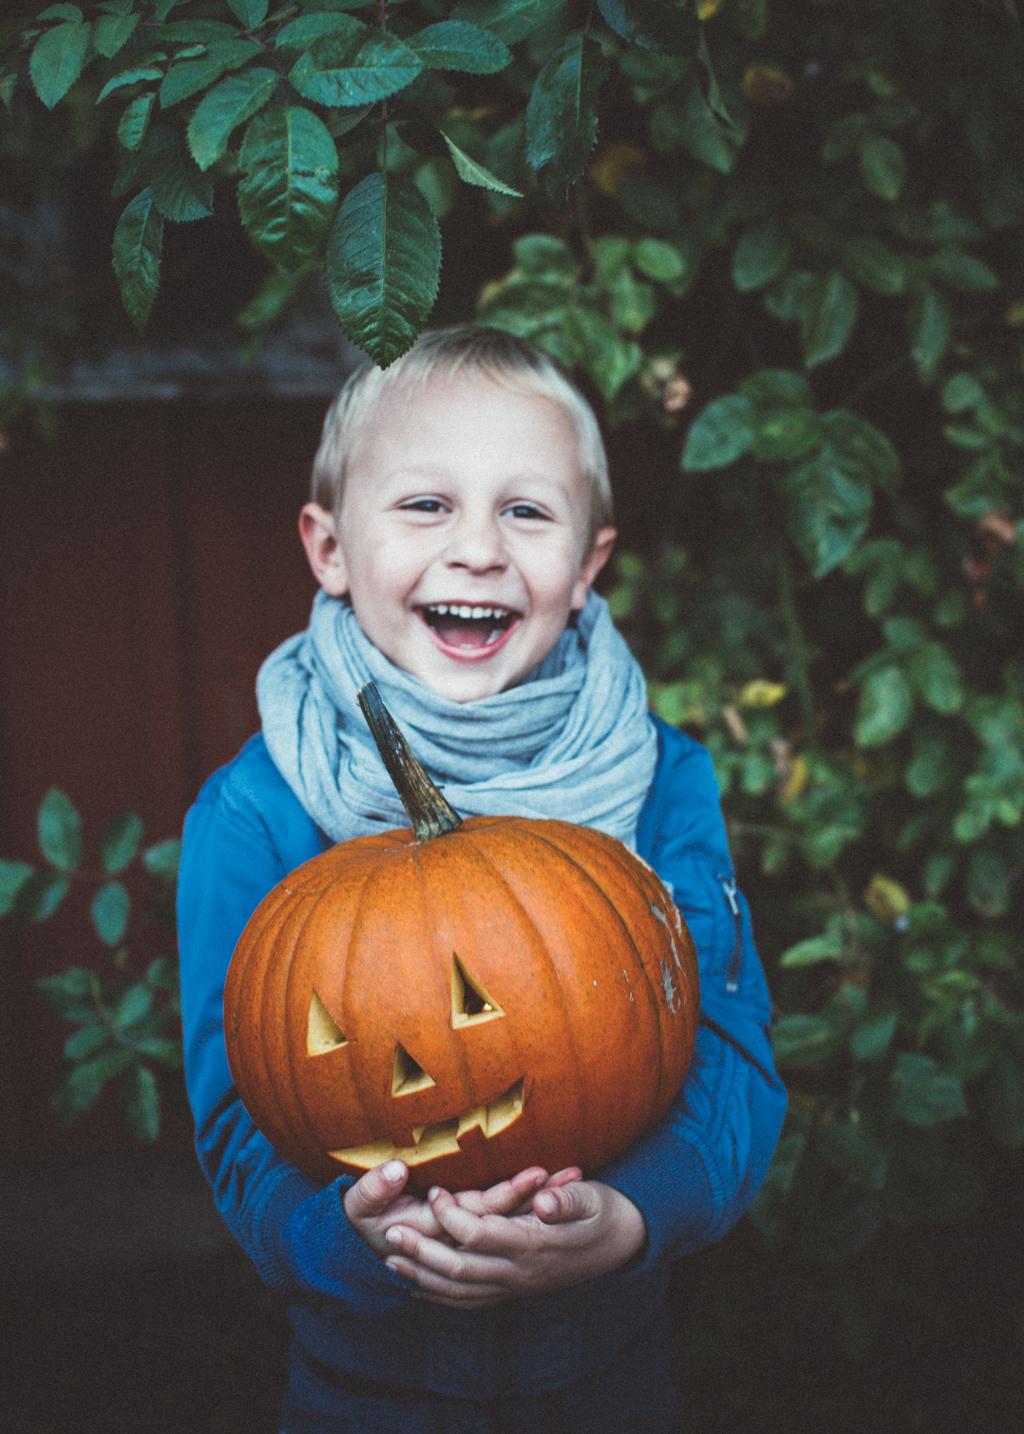 halloweenr_Kristin_ lagerqvist-3715